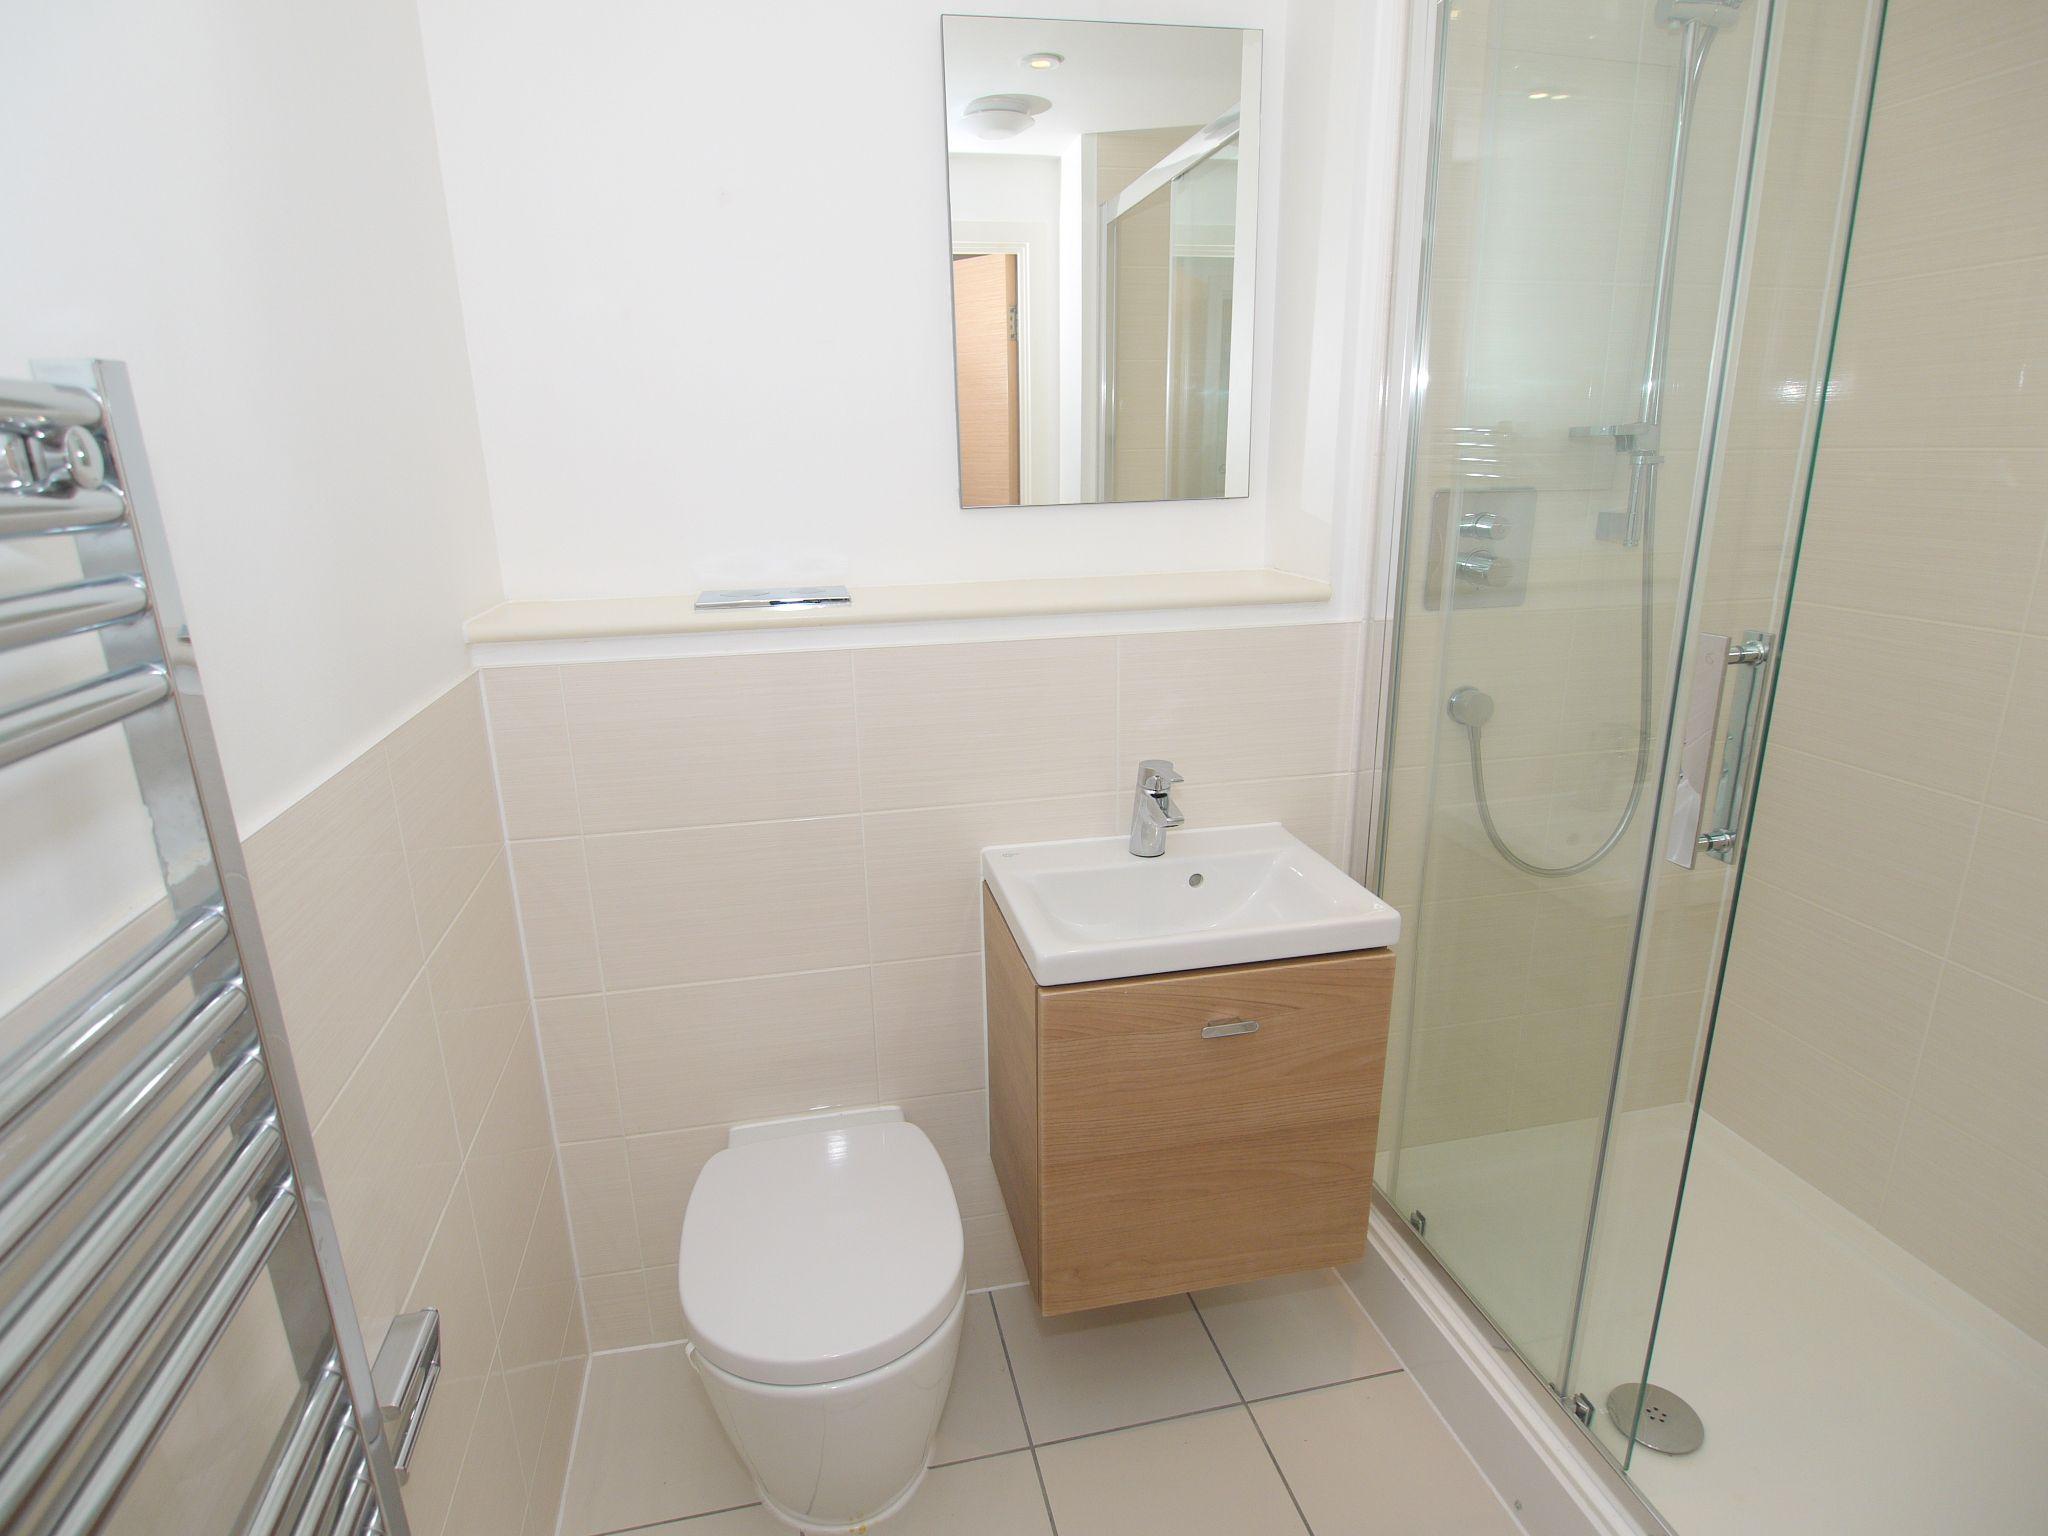 2 bedroom apartment Sale Agreed in Sevenoaks - Photograph 9